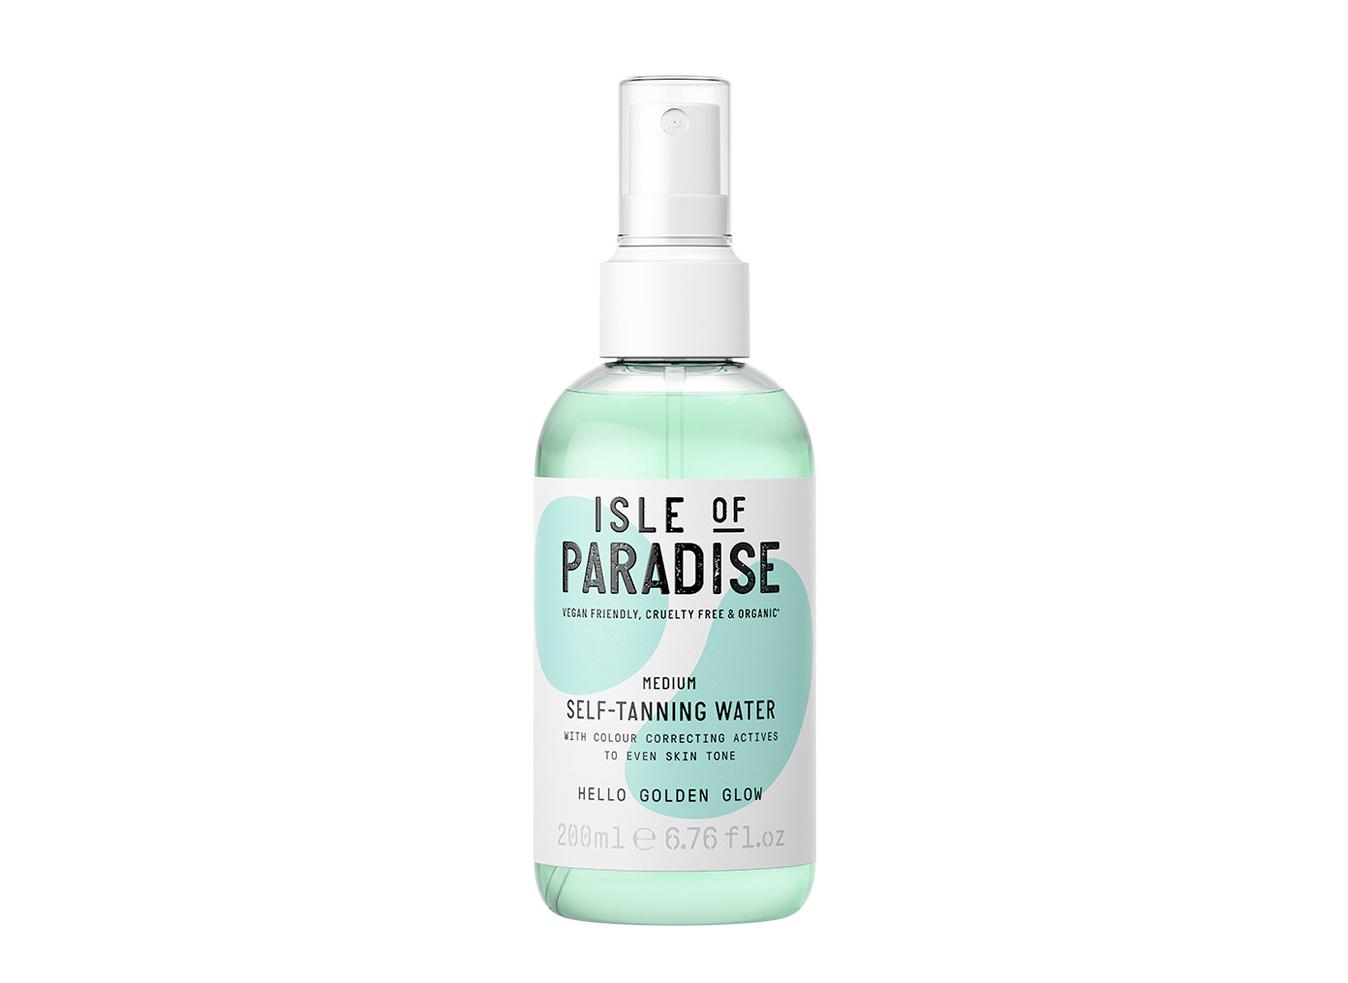 Isle of Paradise Self-Tanning Drops